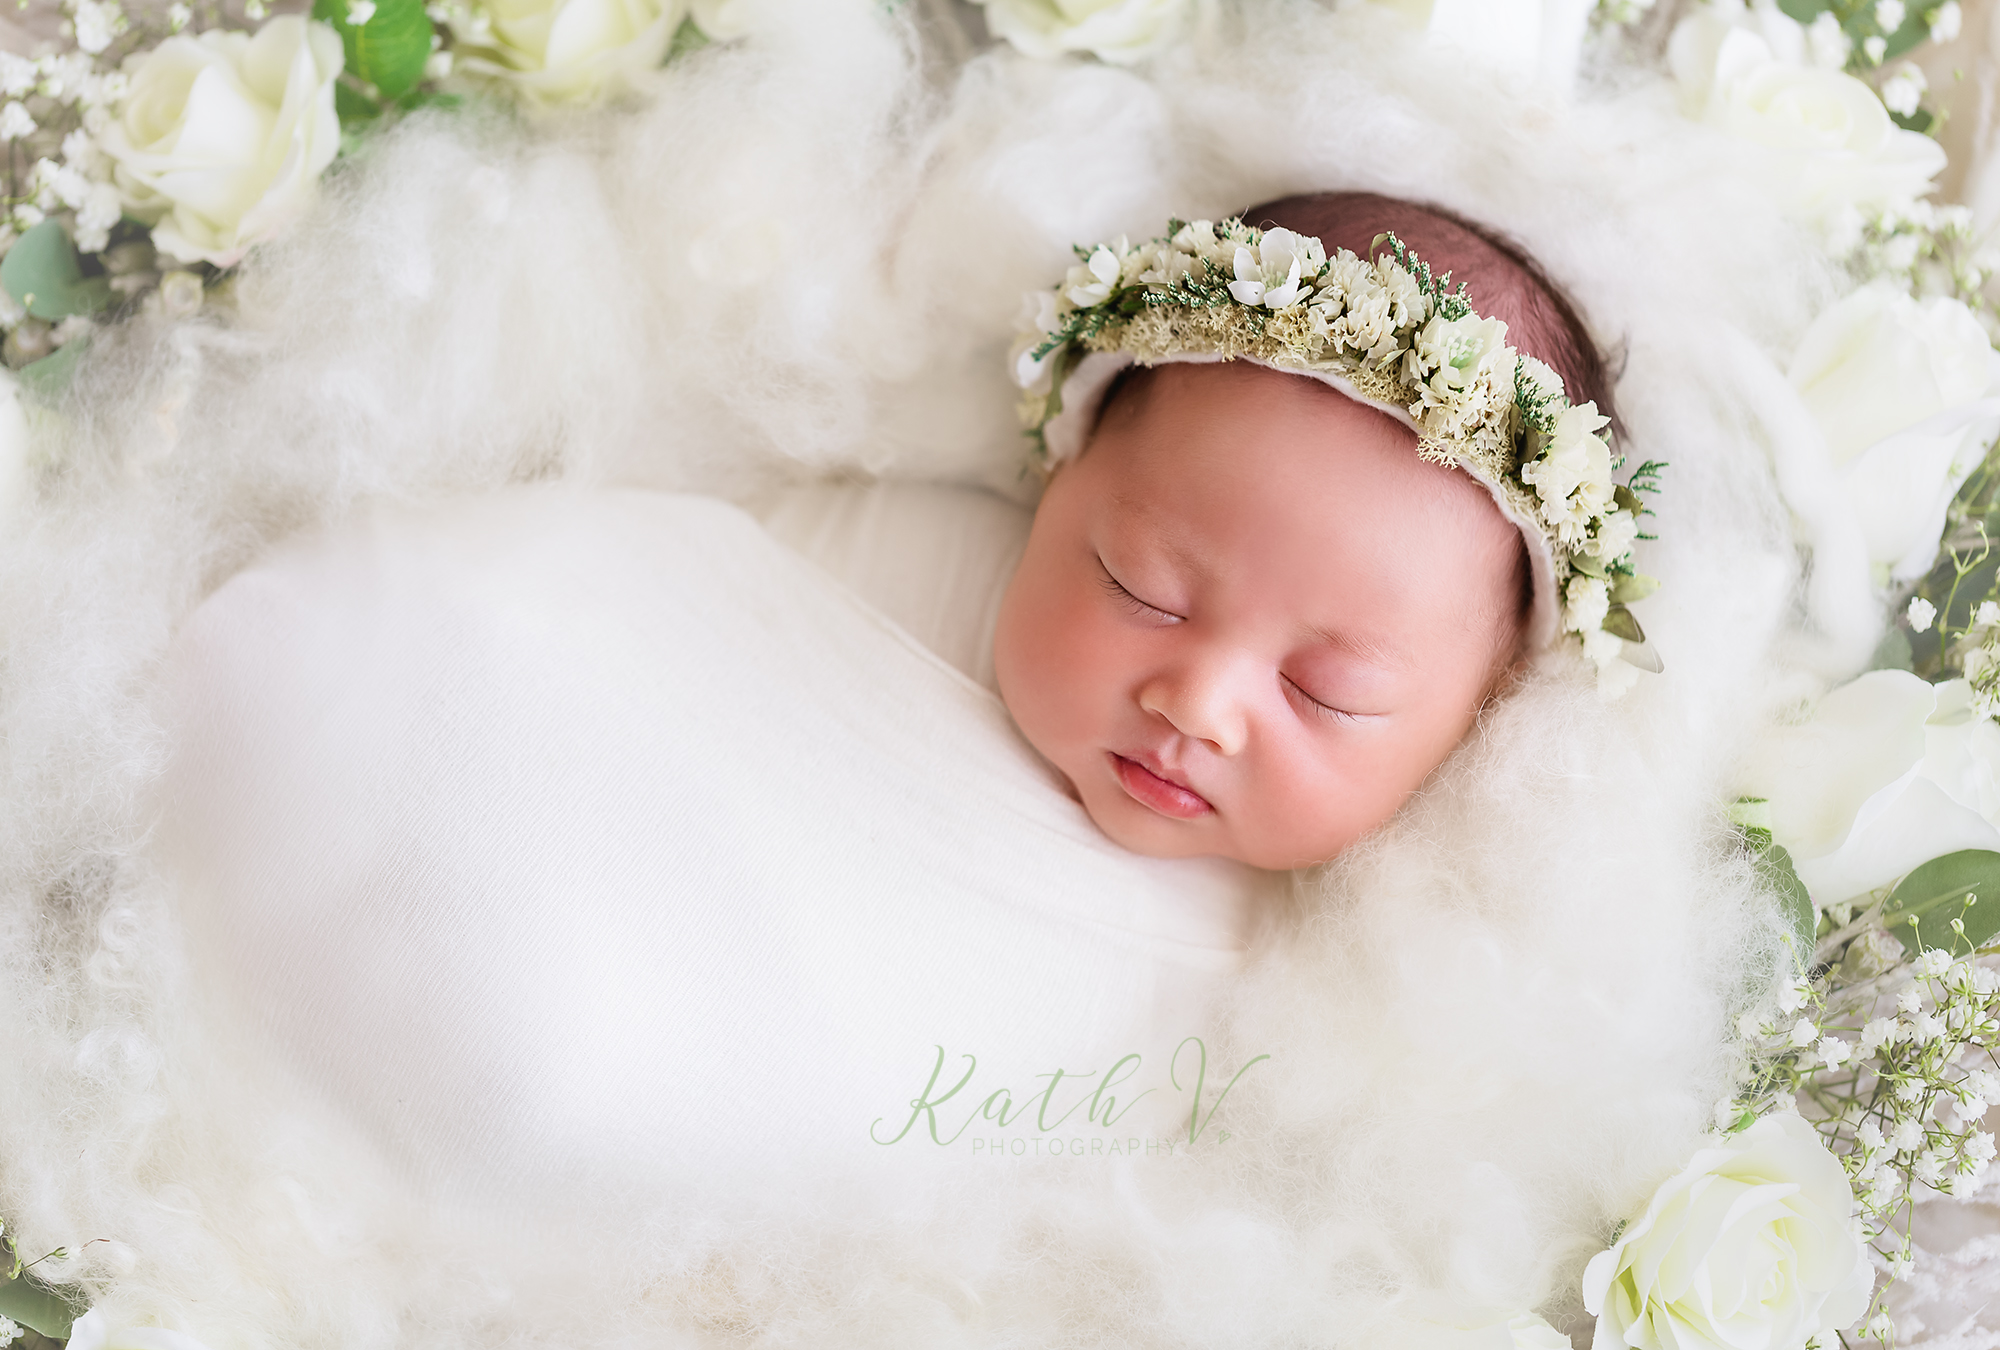 Melbourne-Newborn-Baby-Photography-526.jpg